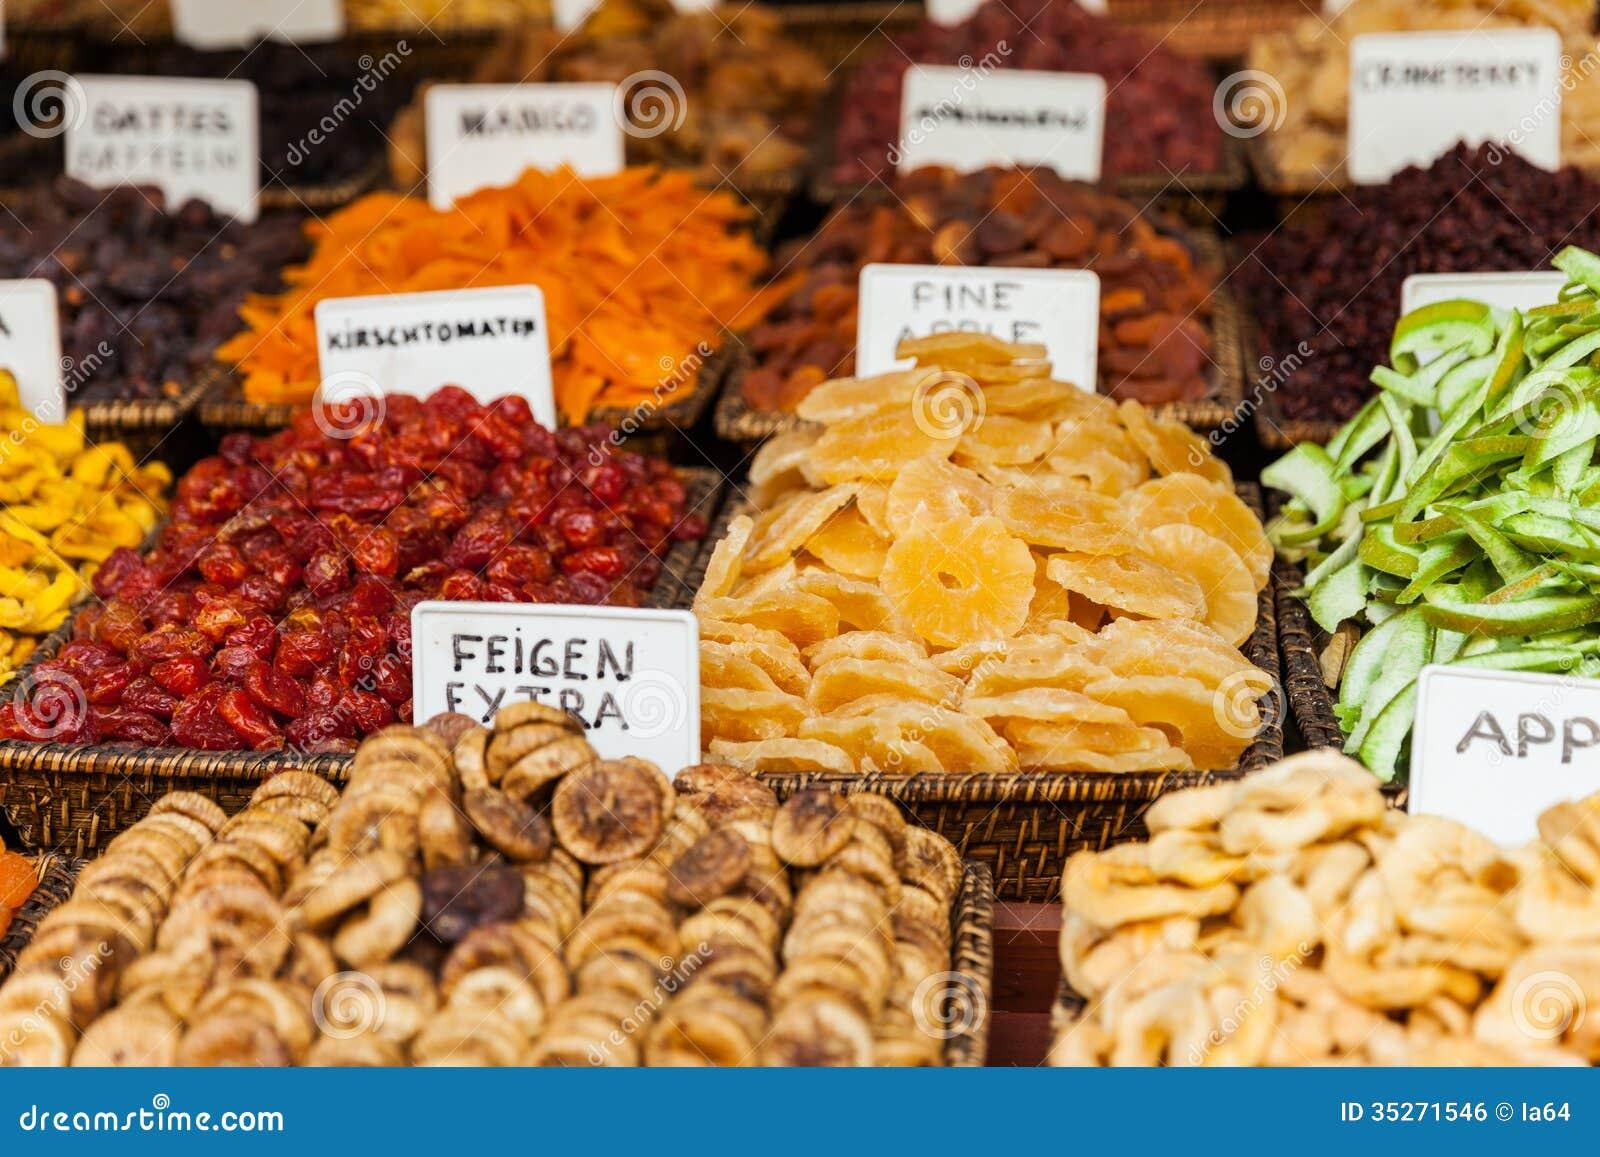 fruit market is dry fruit healthy